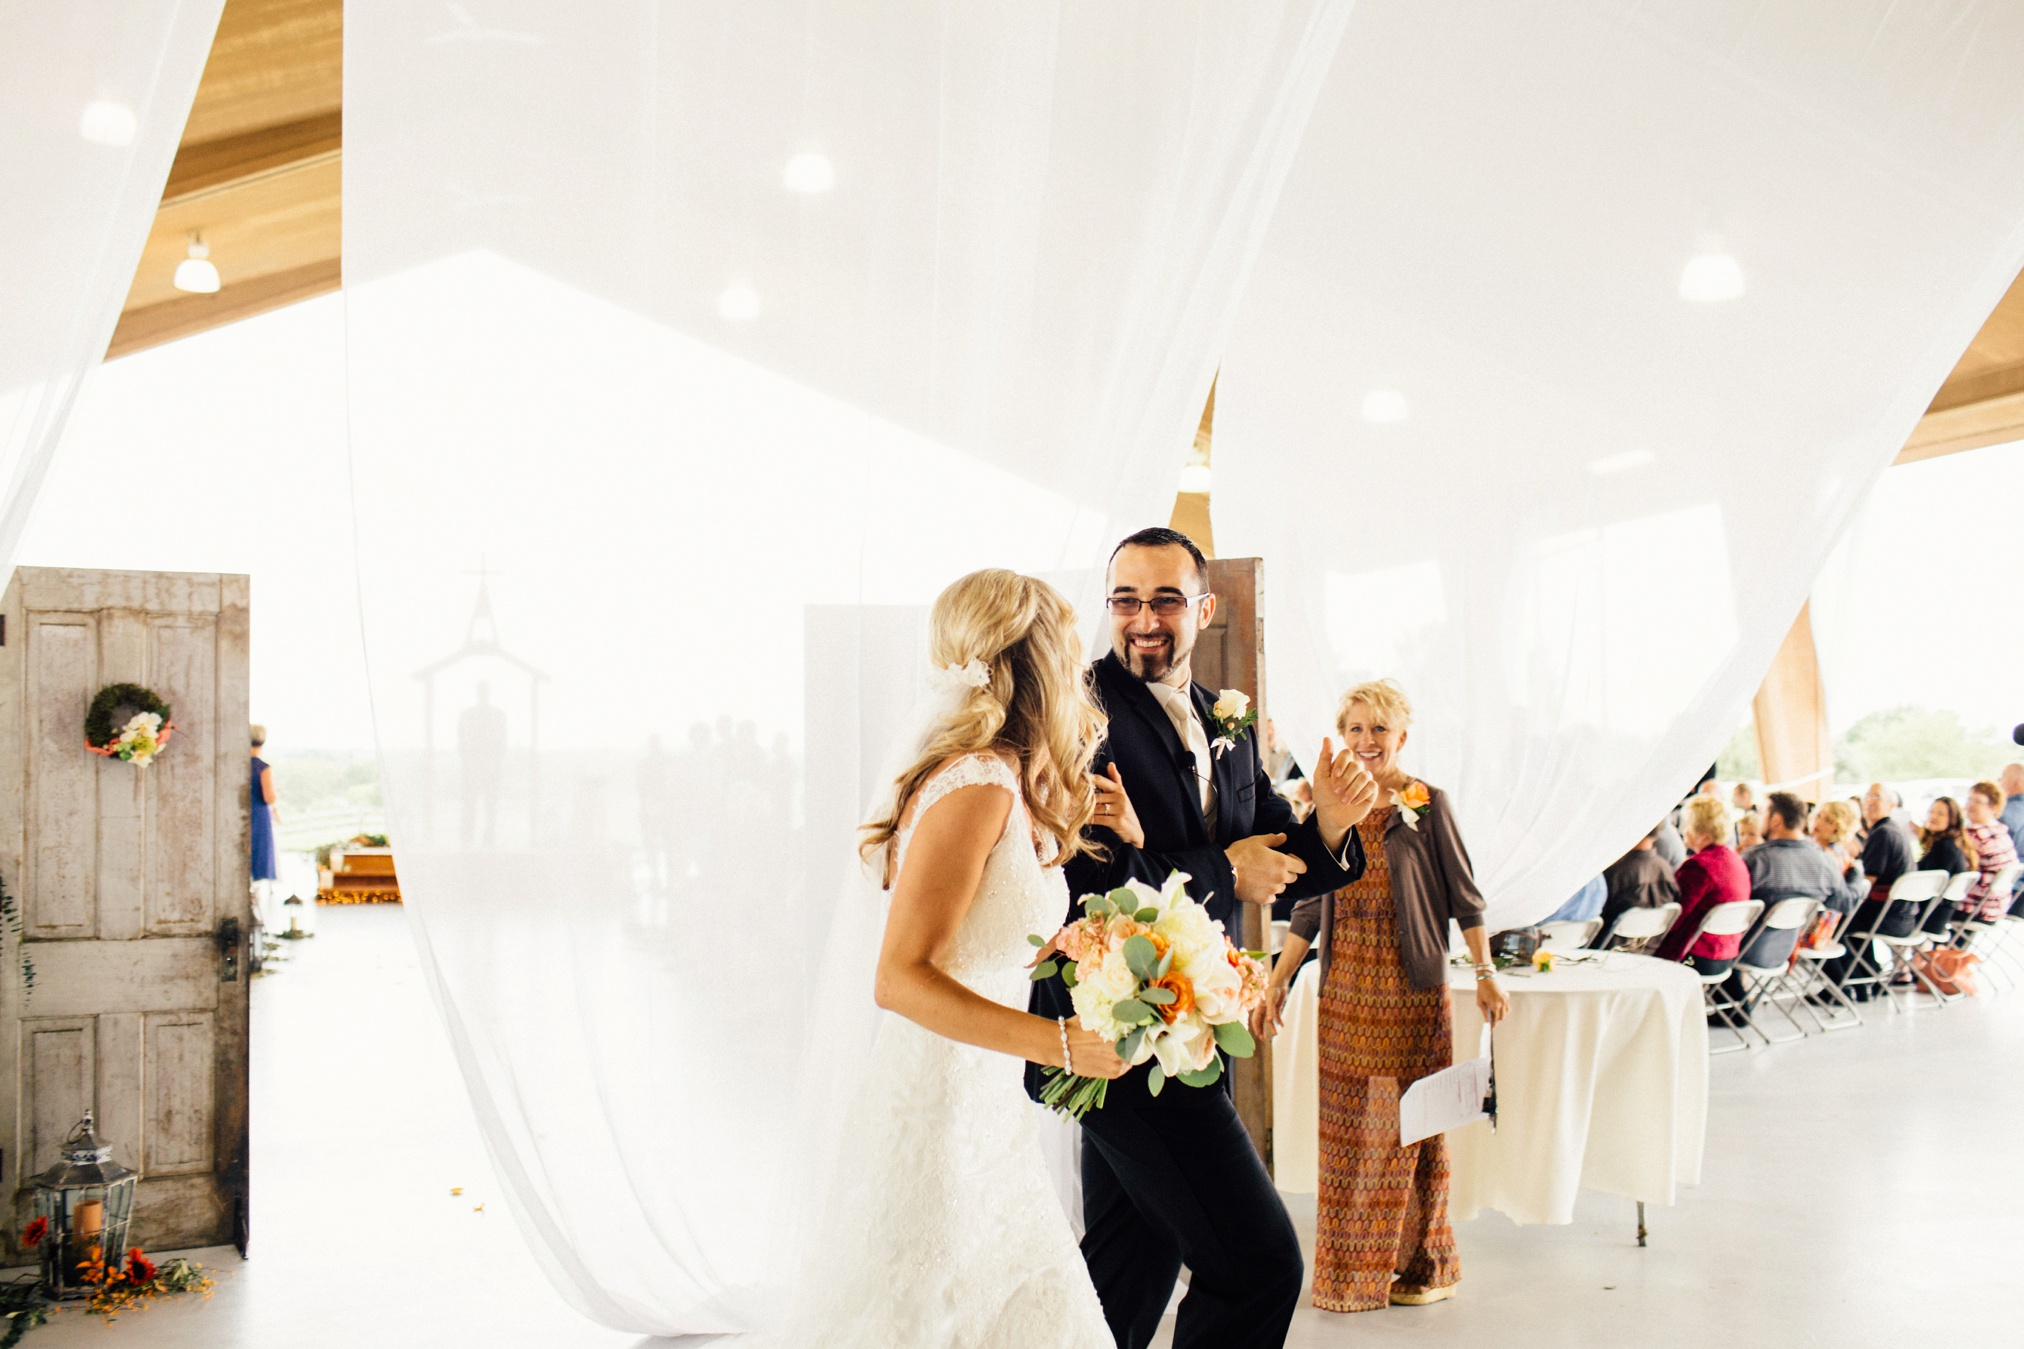 schmid_wedding-572.jpg